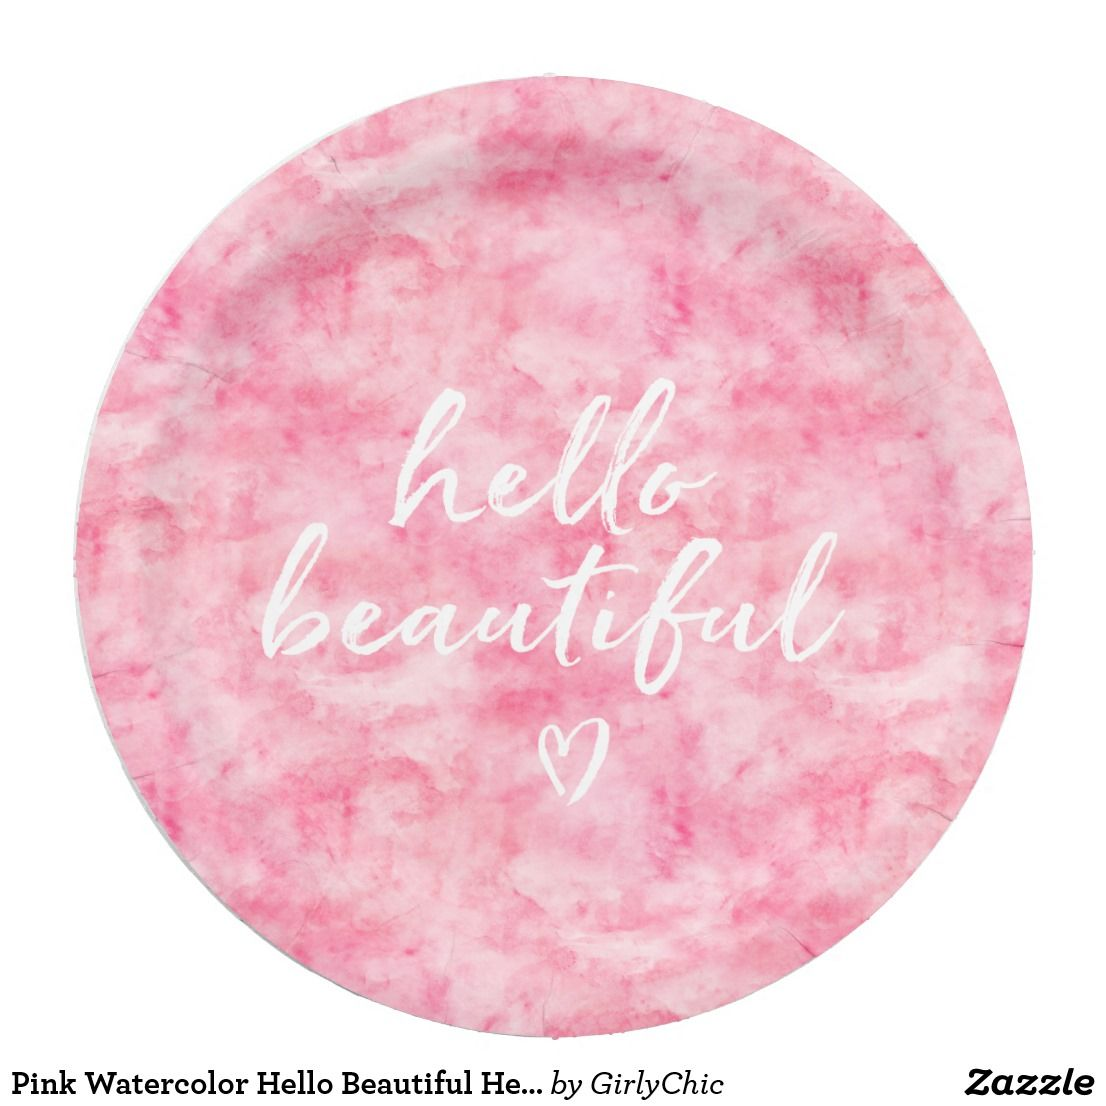 sc 1 st  Pinterest & Pink Watercolor Hello Beautiful Heart Paper Plate